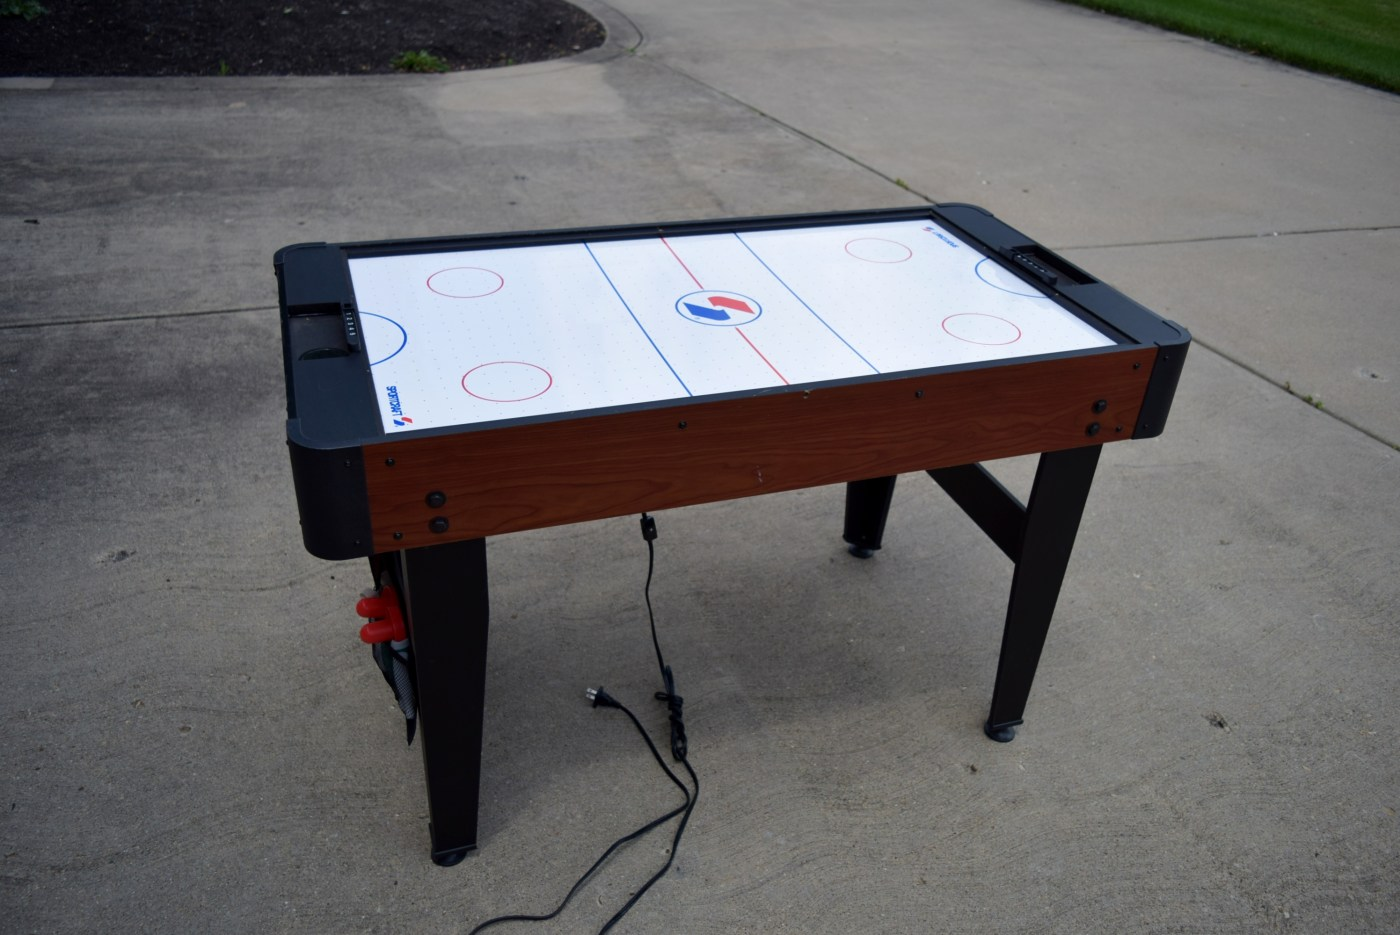 Sportcraft Multi-game Table Including Foosball Air Hockey Tennis And Ebth